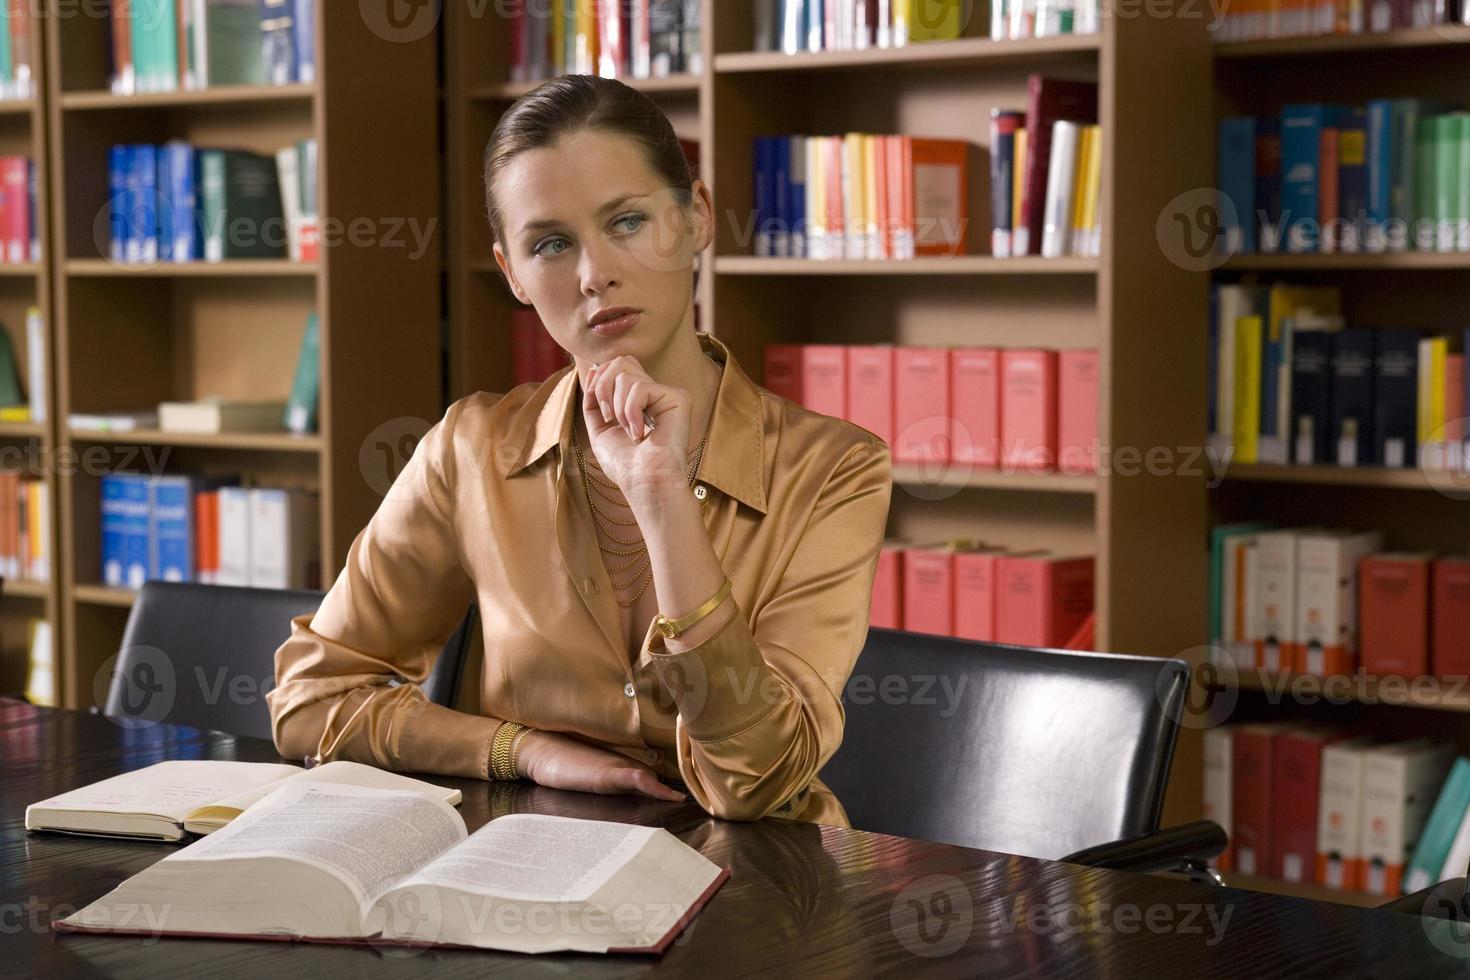 femme, livre, bureau, bibliothèque photo